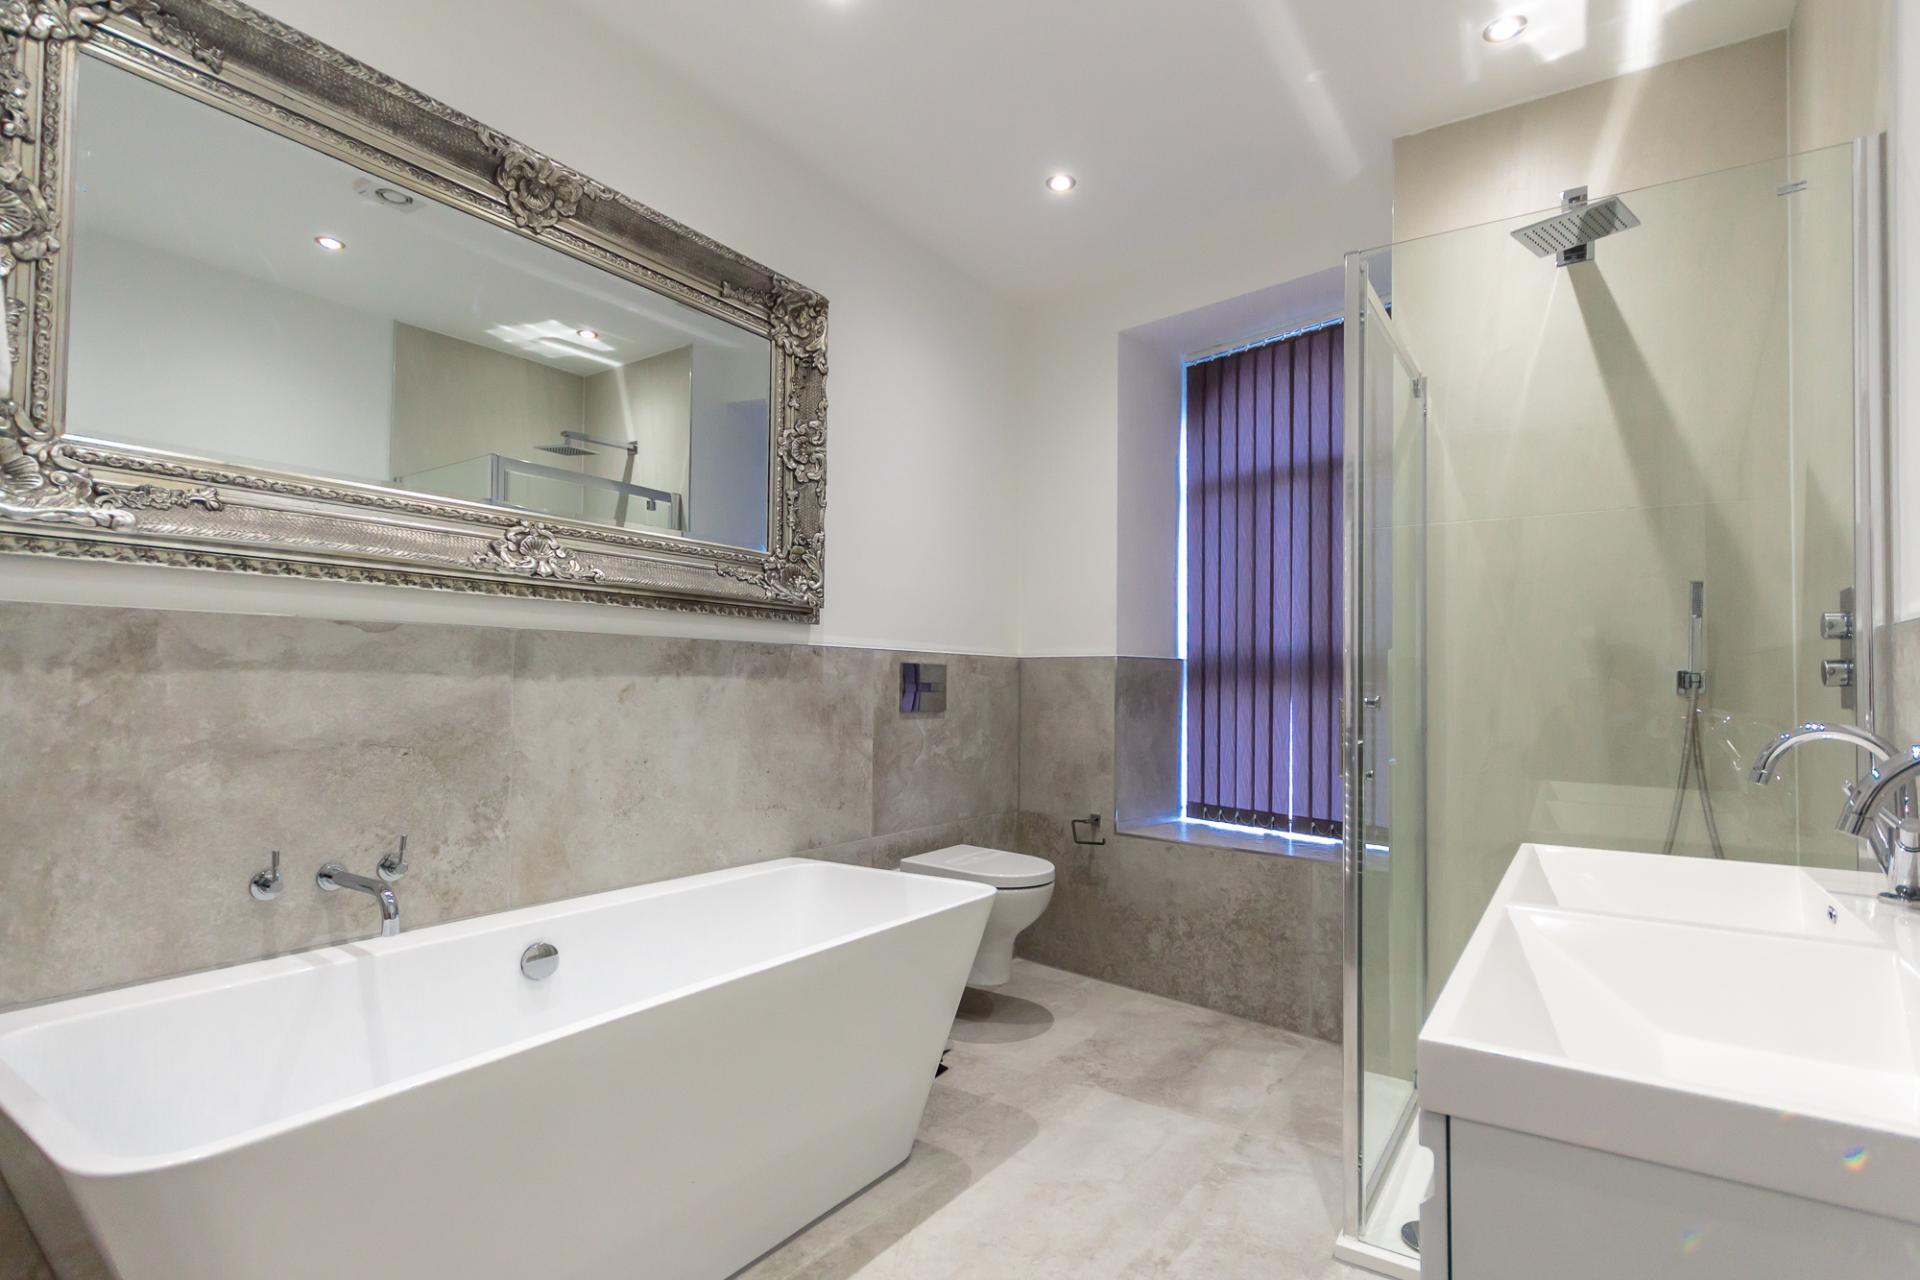 Bathroom at The Crescent Serviced Apartments